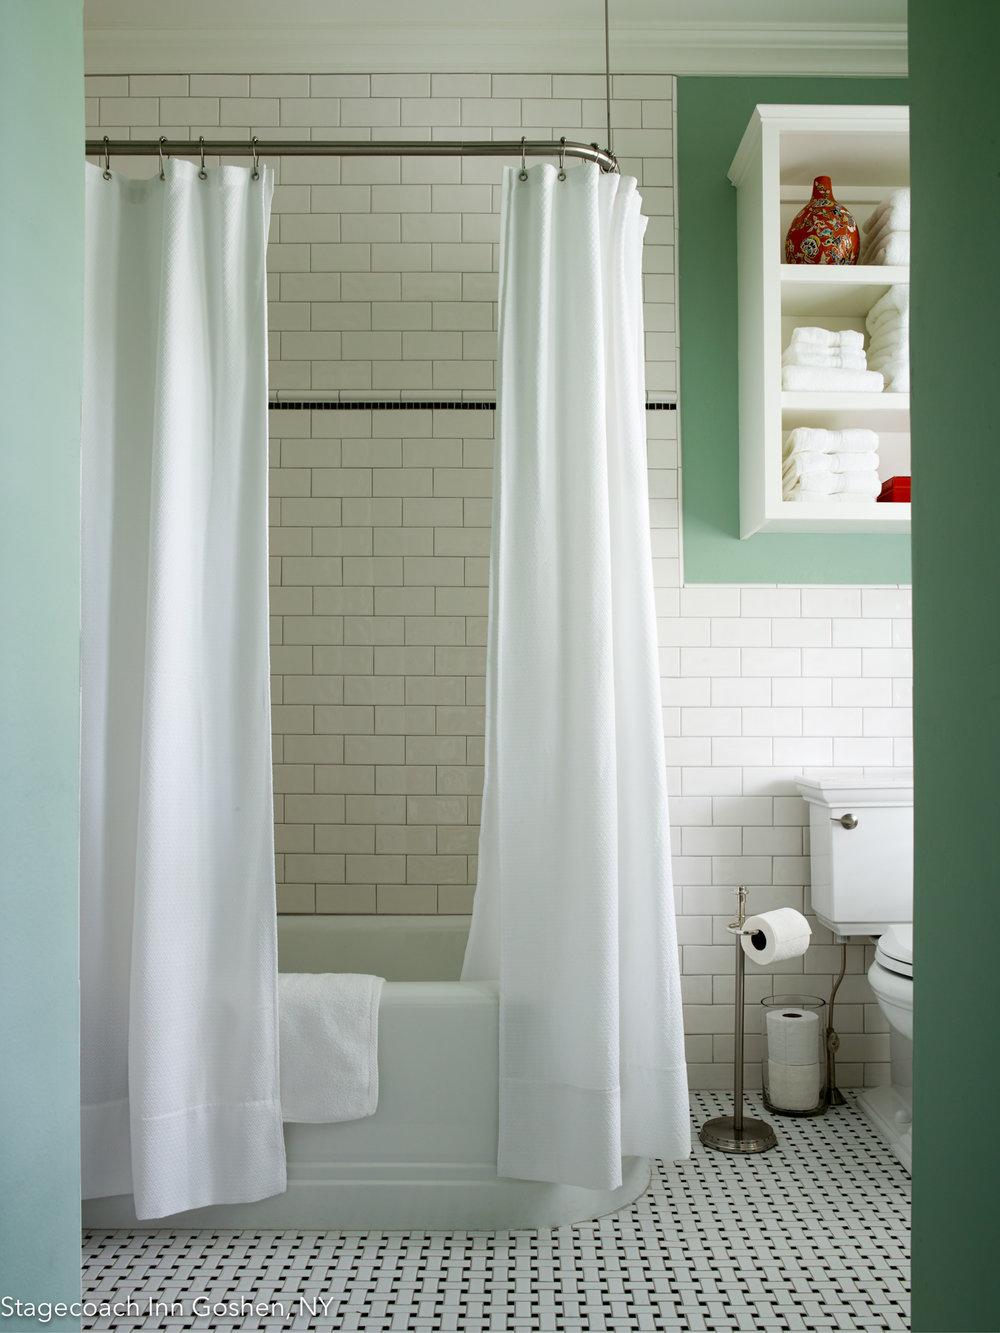 Guggenheim_Bathroom.jpg